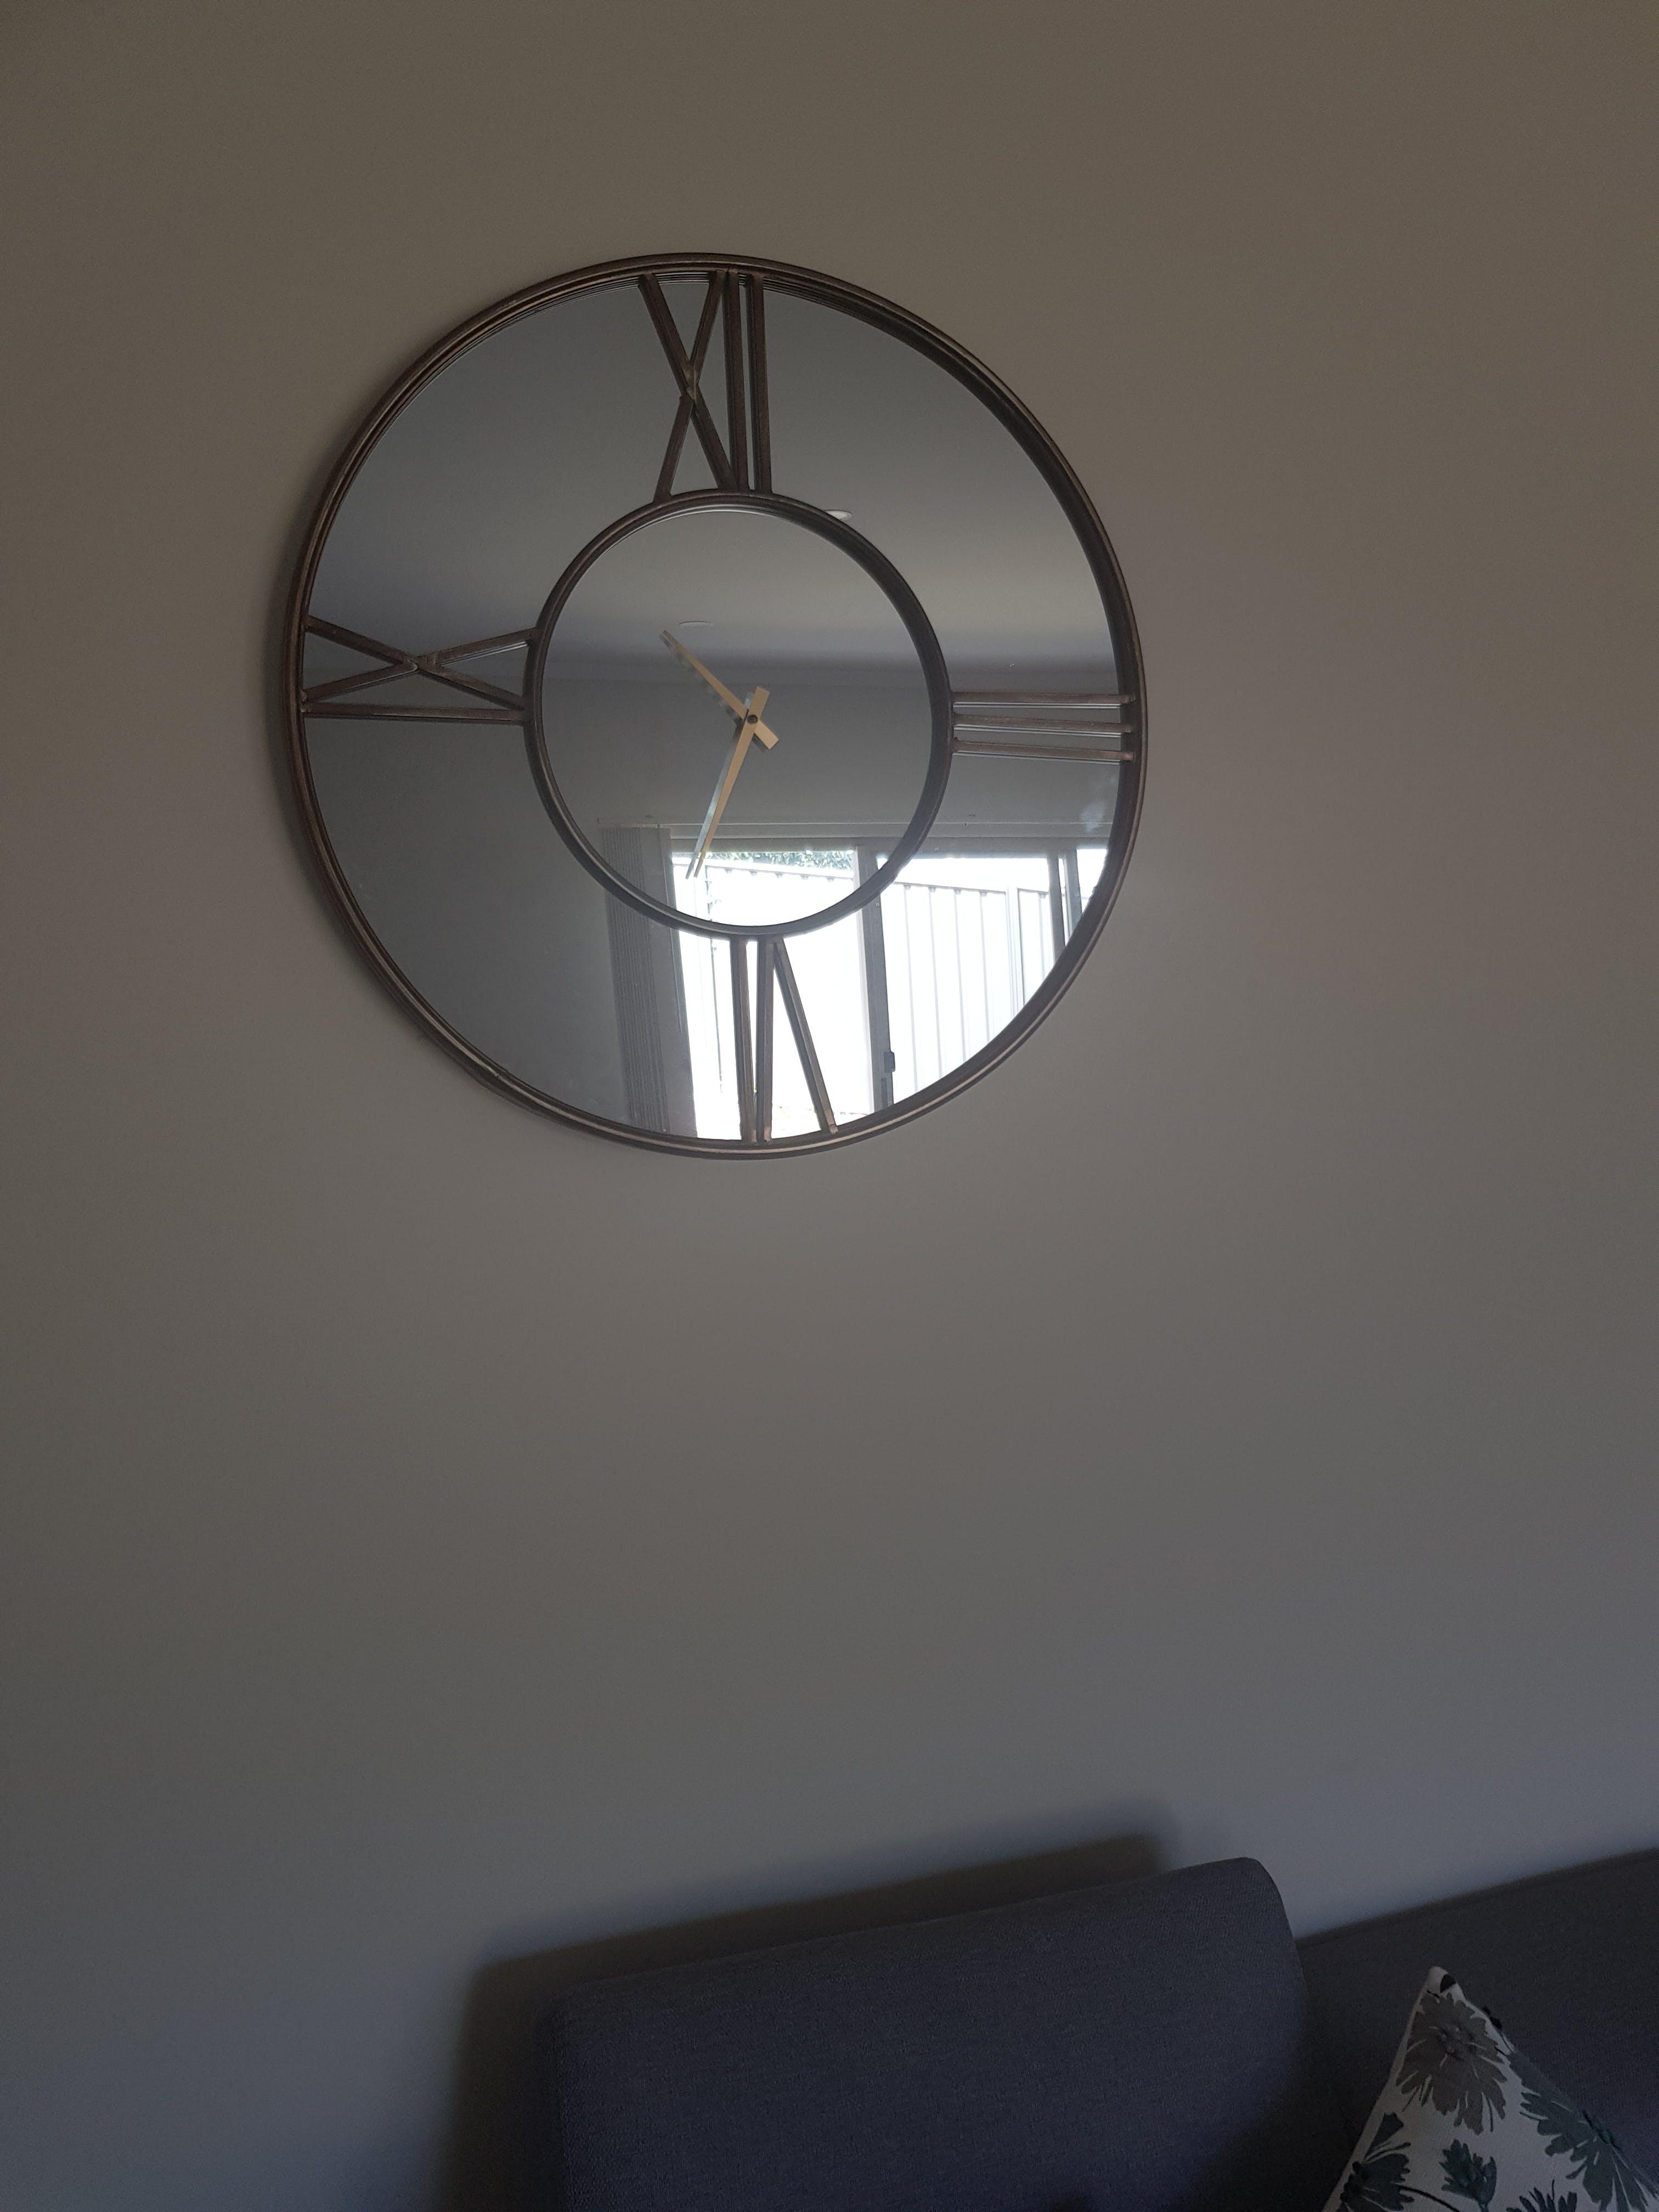 Mirrored Contemporary Round Wall Clock, 70cm